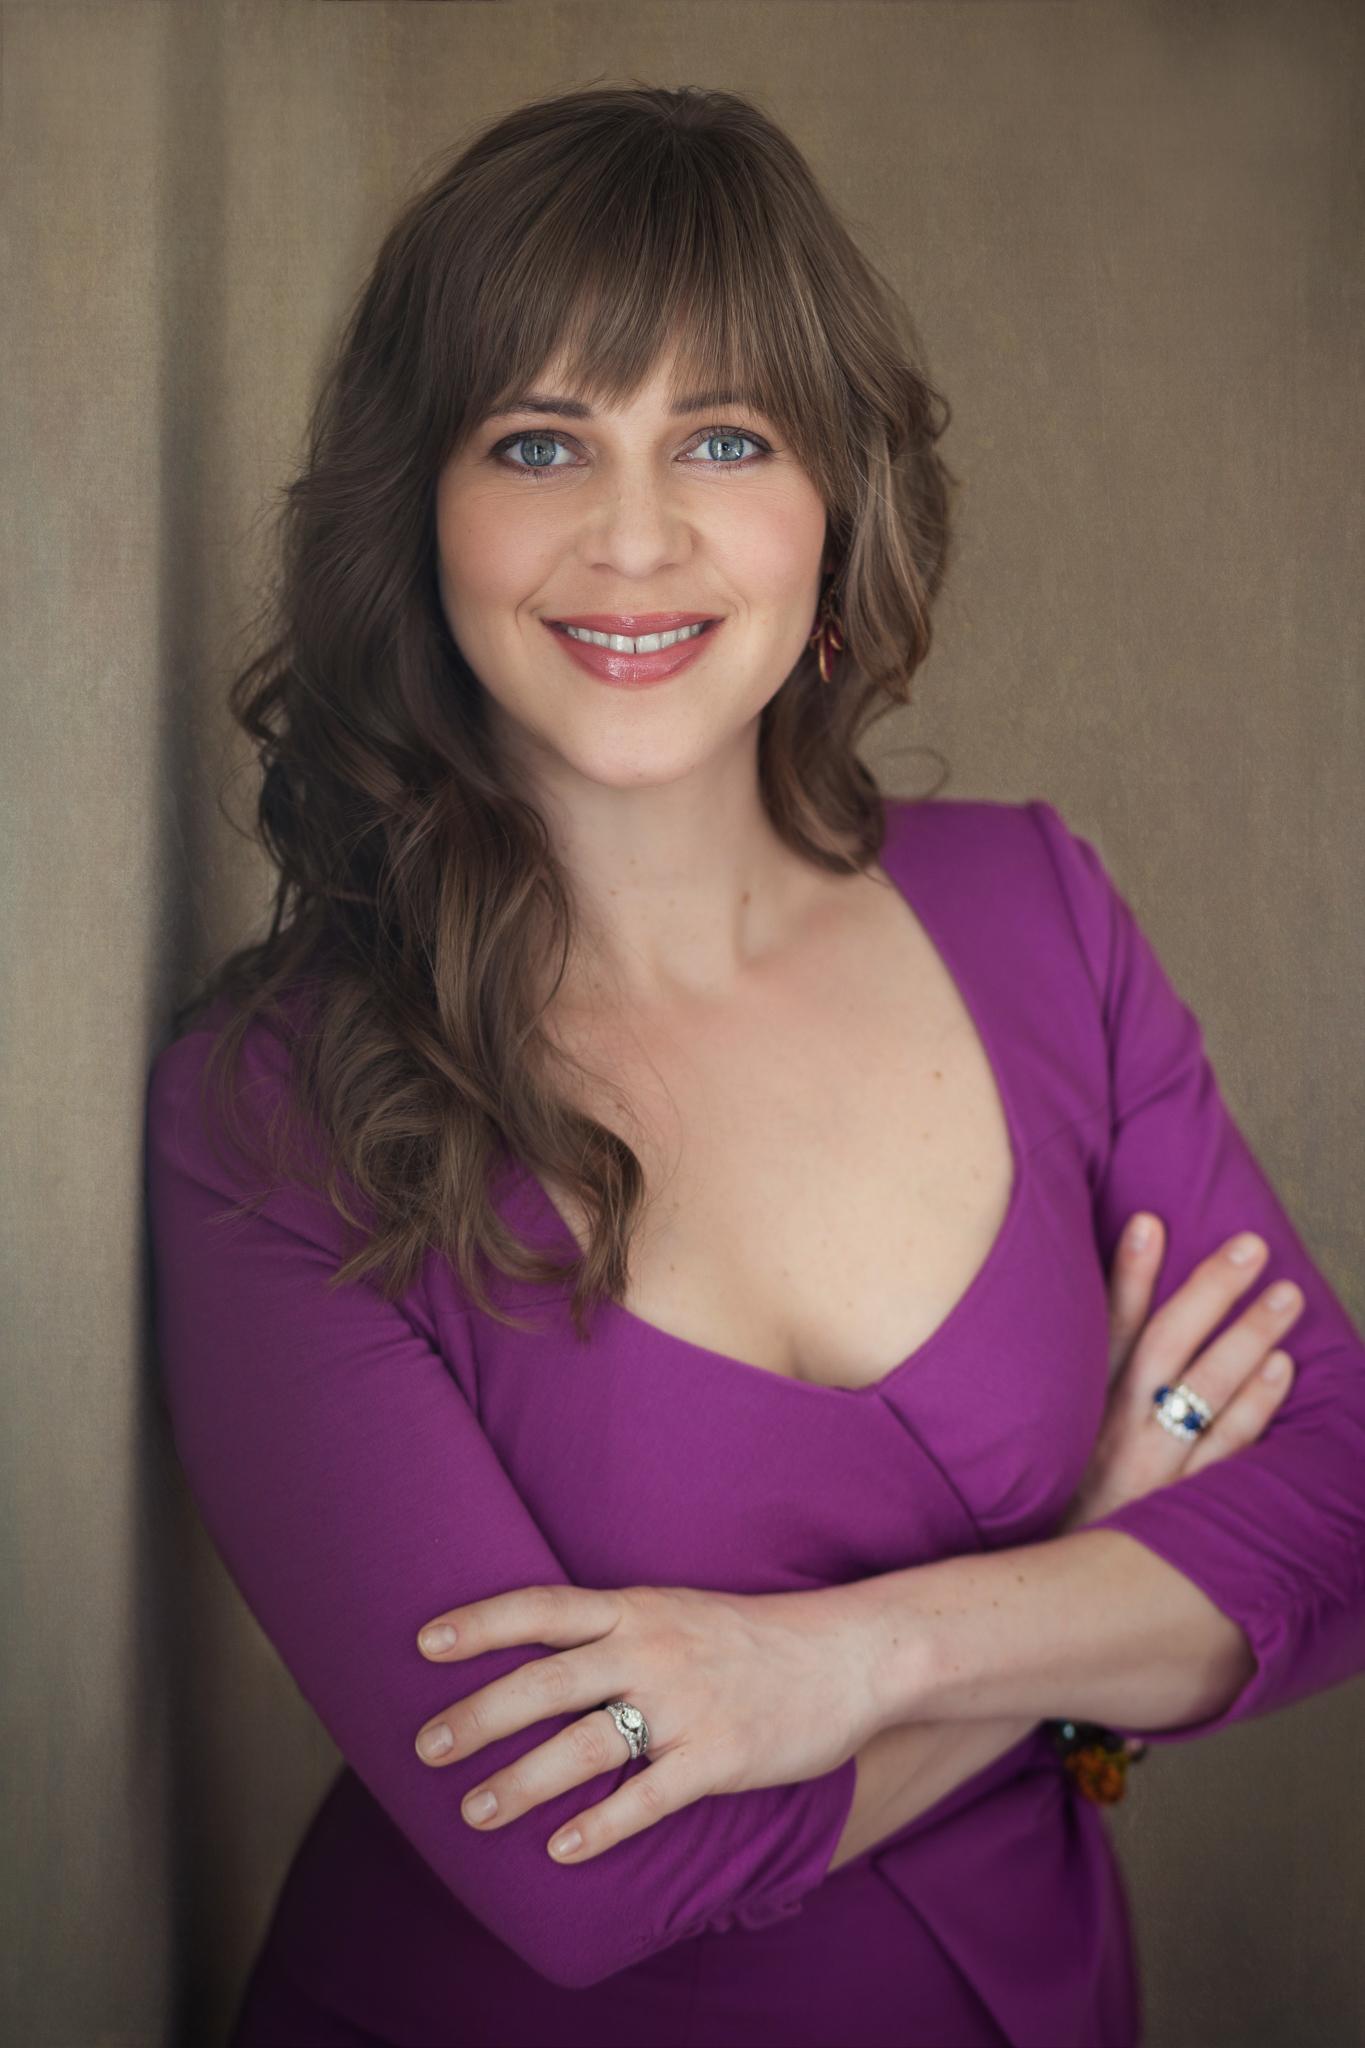 Lisa Damico Portraits │DC Arlington Alexandria Headshot │Executive Coach Headshot